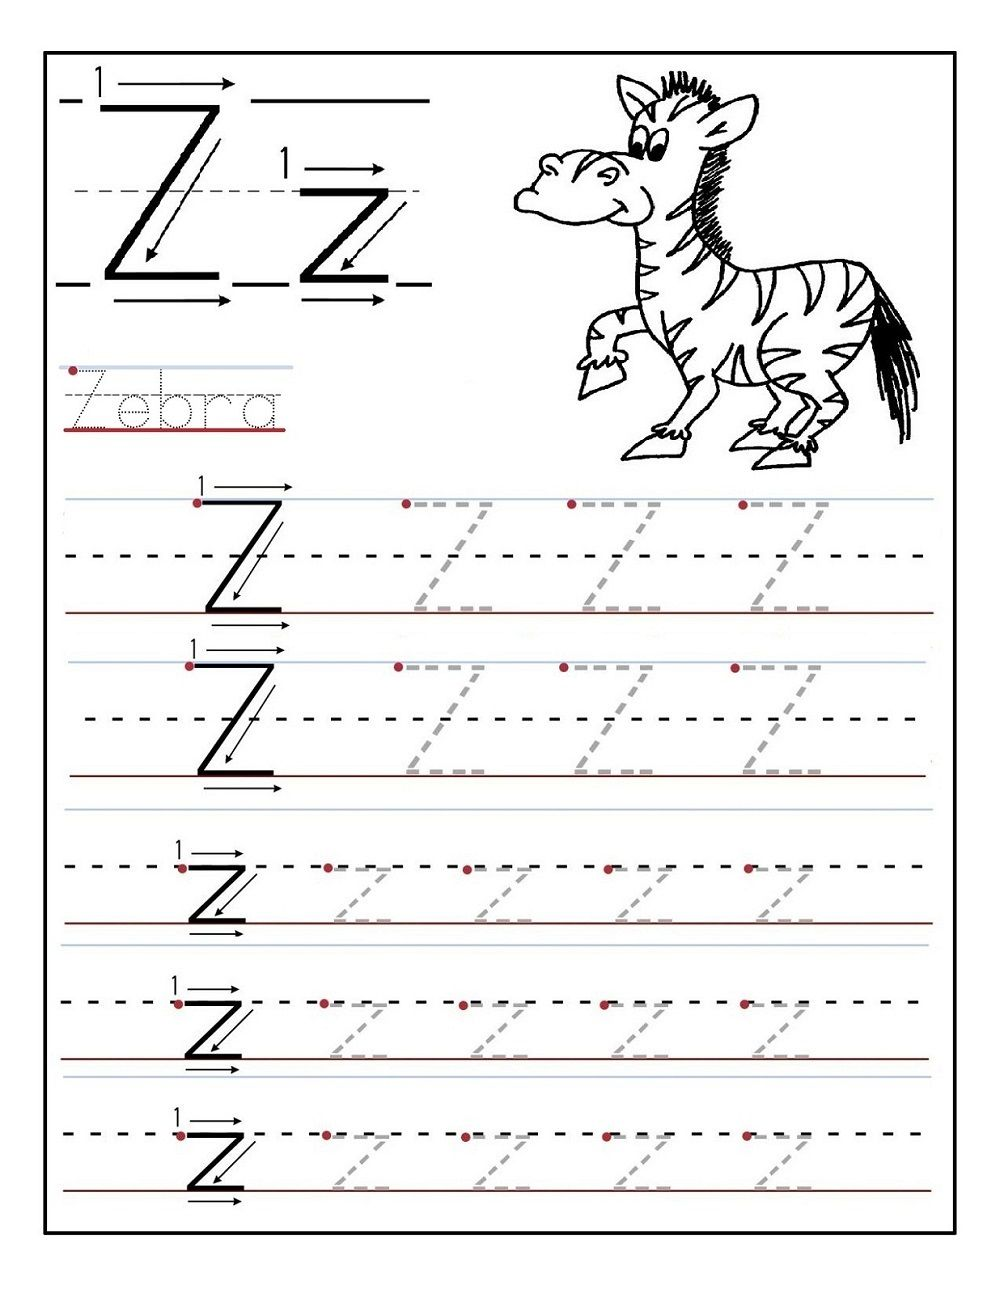 Tracing Worksheets 3 Year Old Fun Kiddo Shelter   Alphabet worksheets  preschool [ 1294 x 1000 Pixel ]